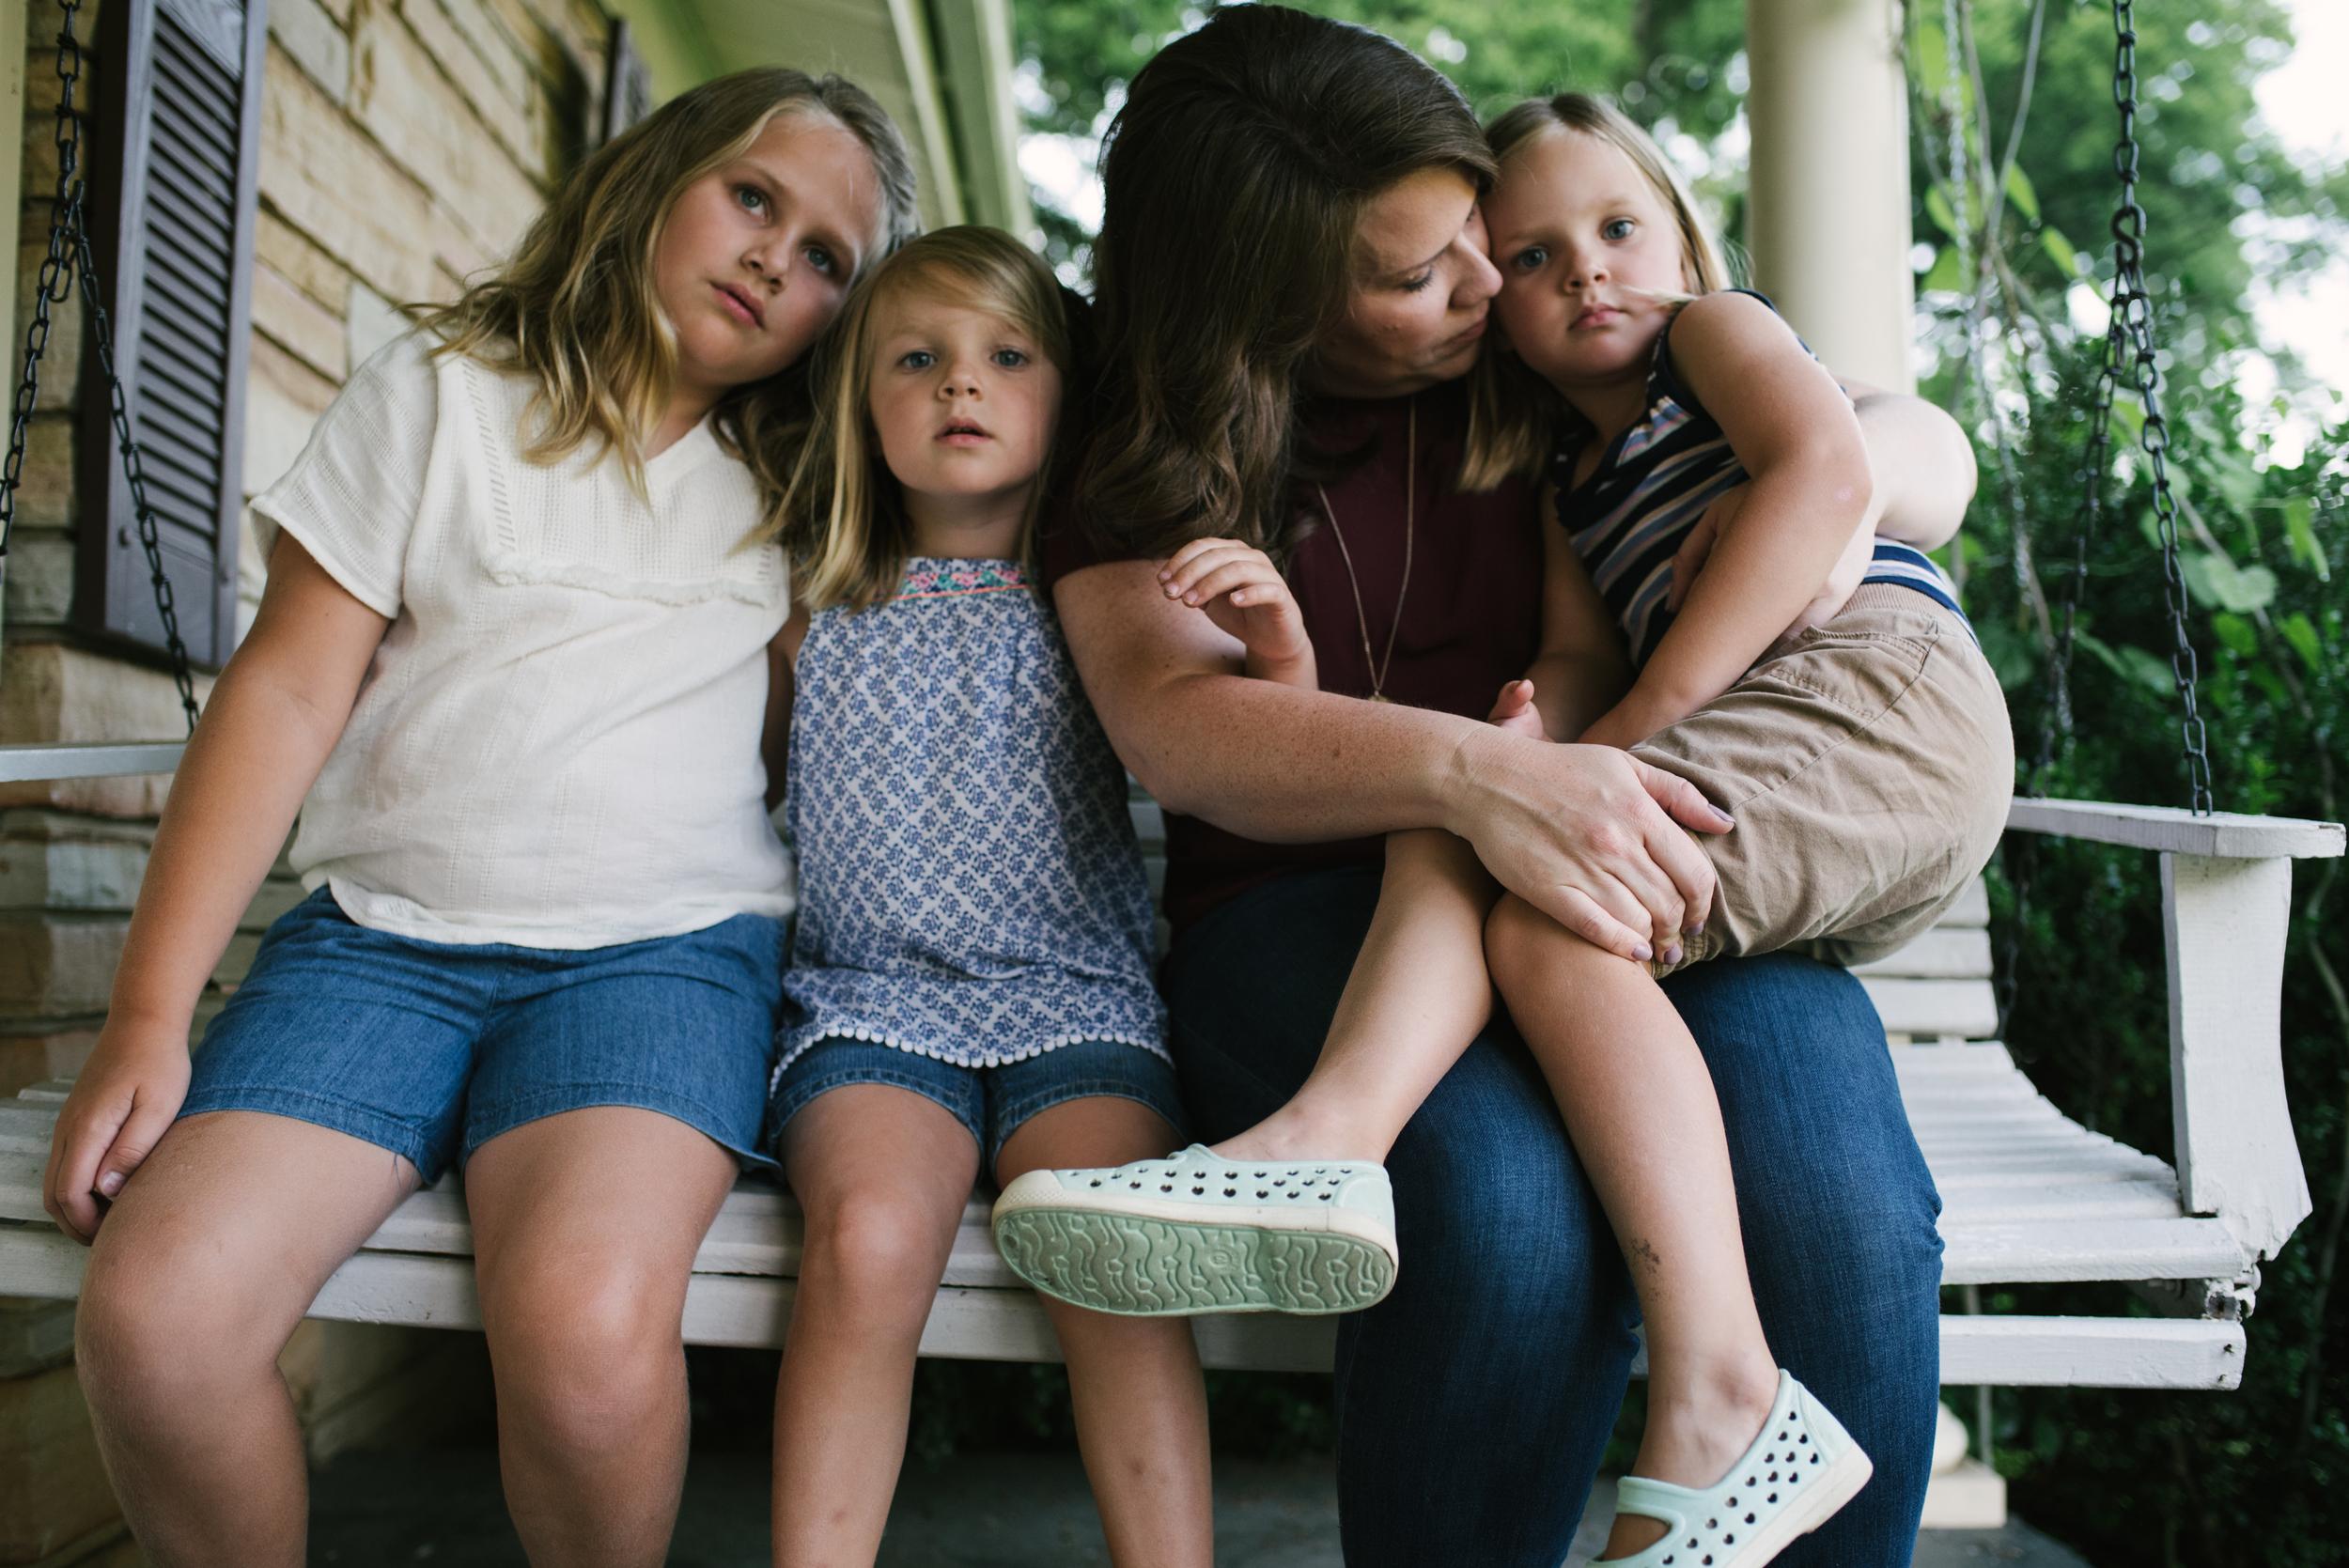 Mae Burke Motherhood Photographer Family Session at Home in Alabama-7.JPG